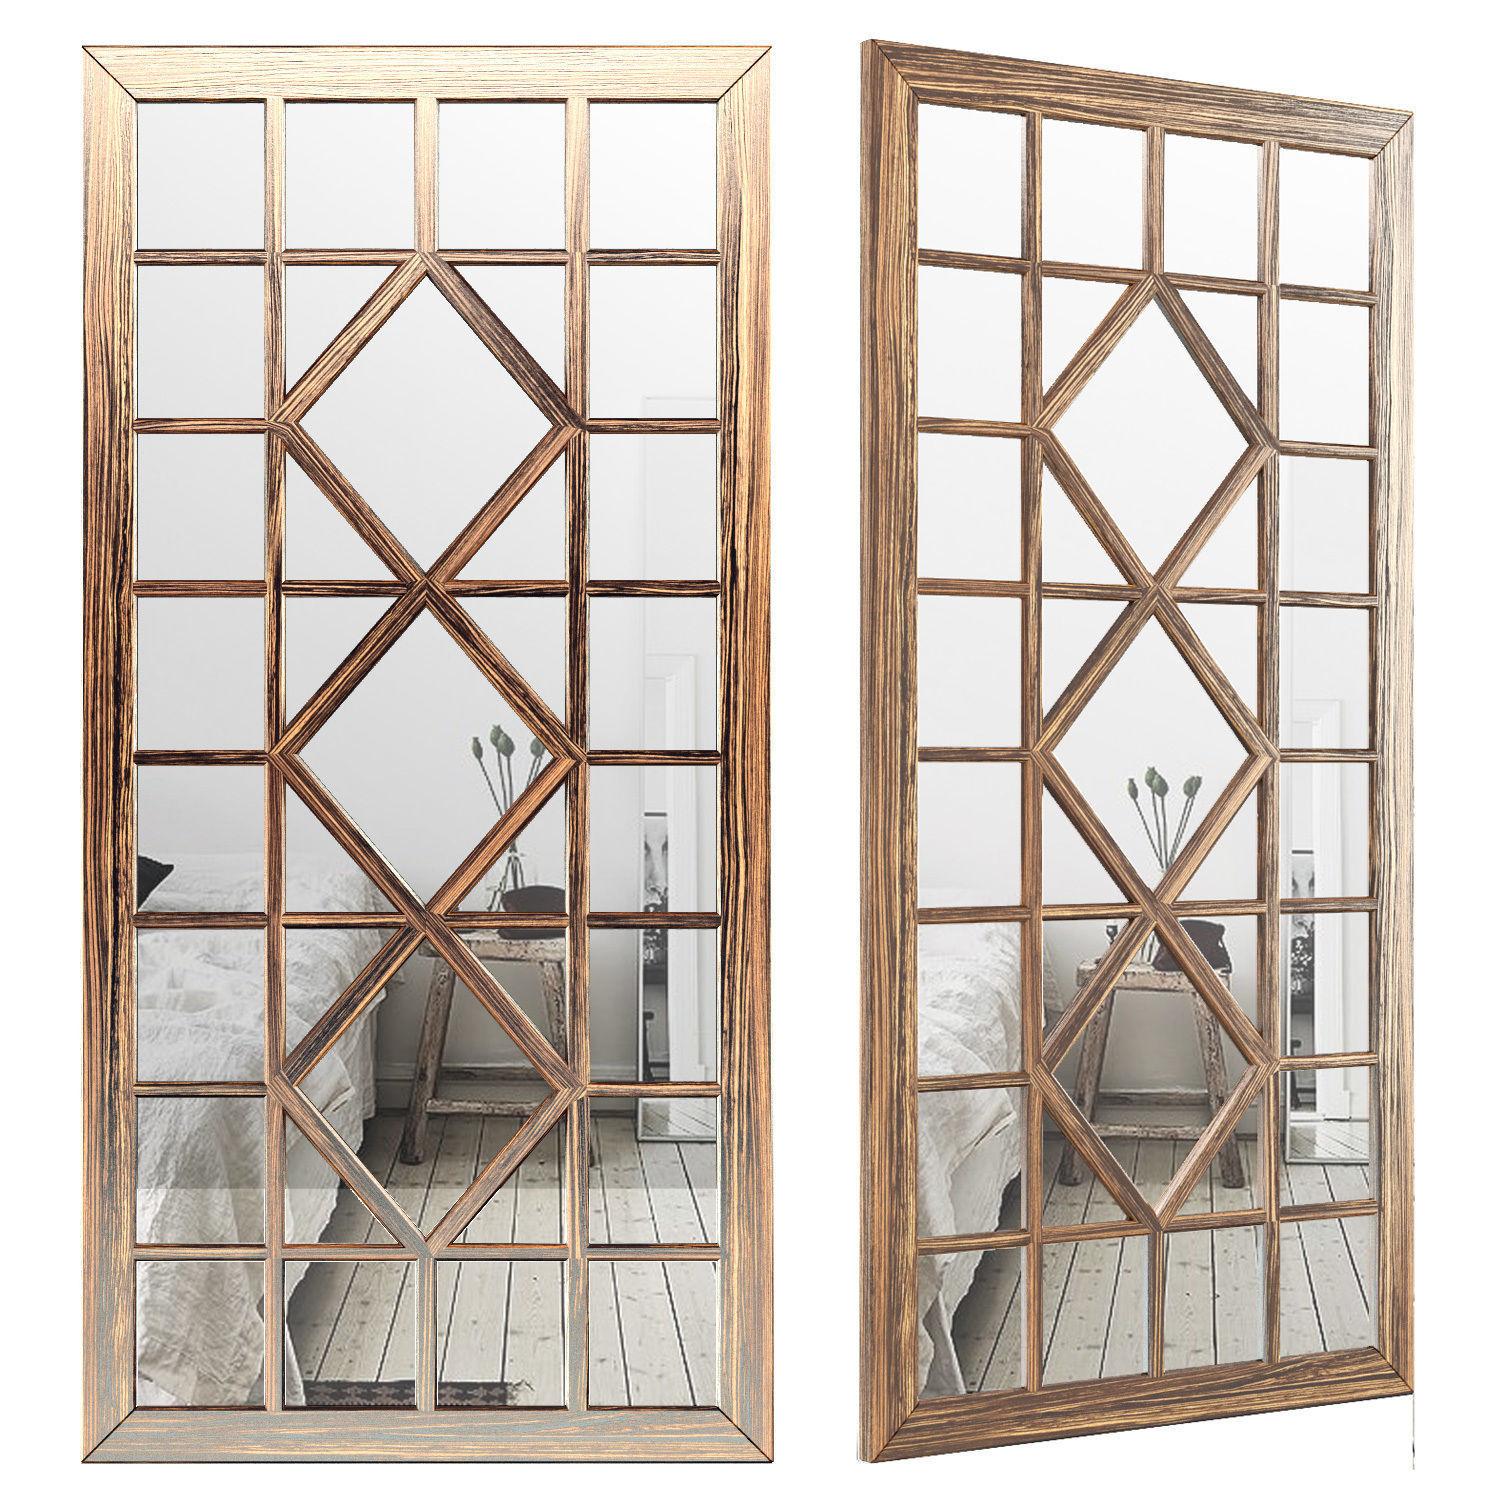 Rectangular Ivory Accent Wall Mirror Lrkm2415 | 3D Model Pertaining To Rectangle Accent Wall Mirrors (Gallery 25 of 30)